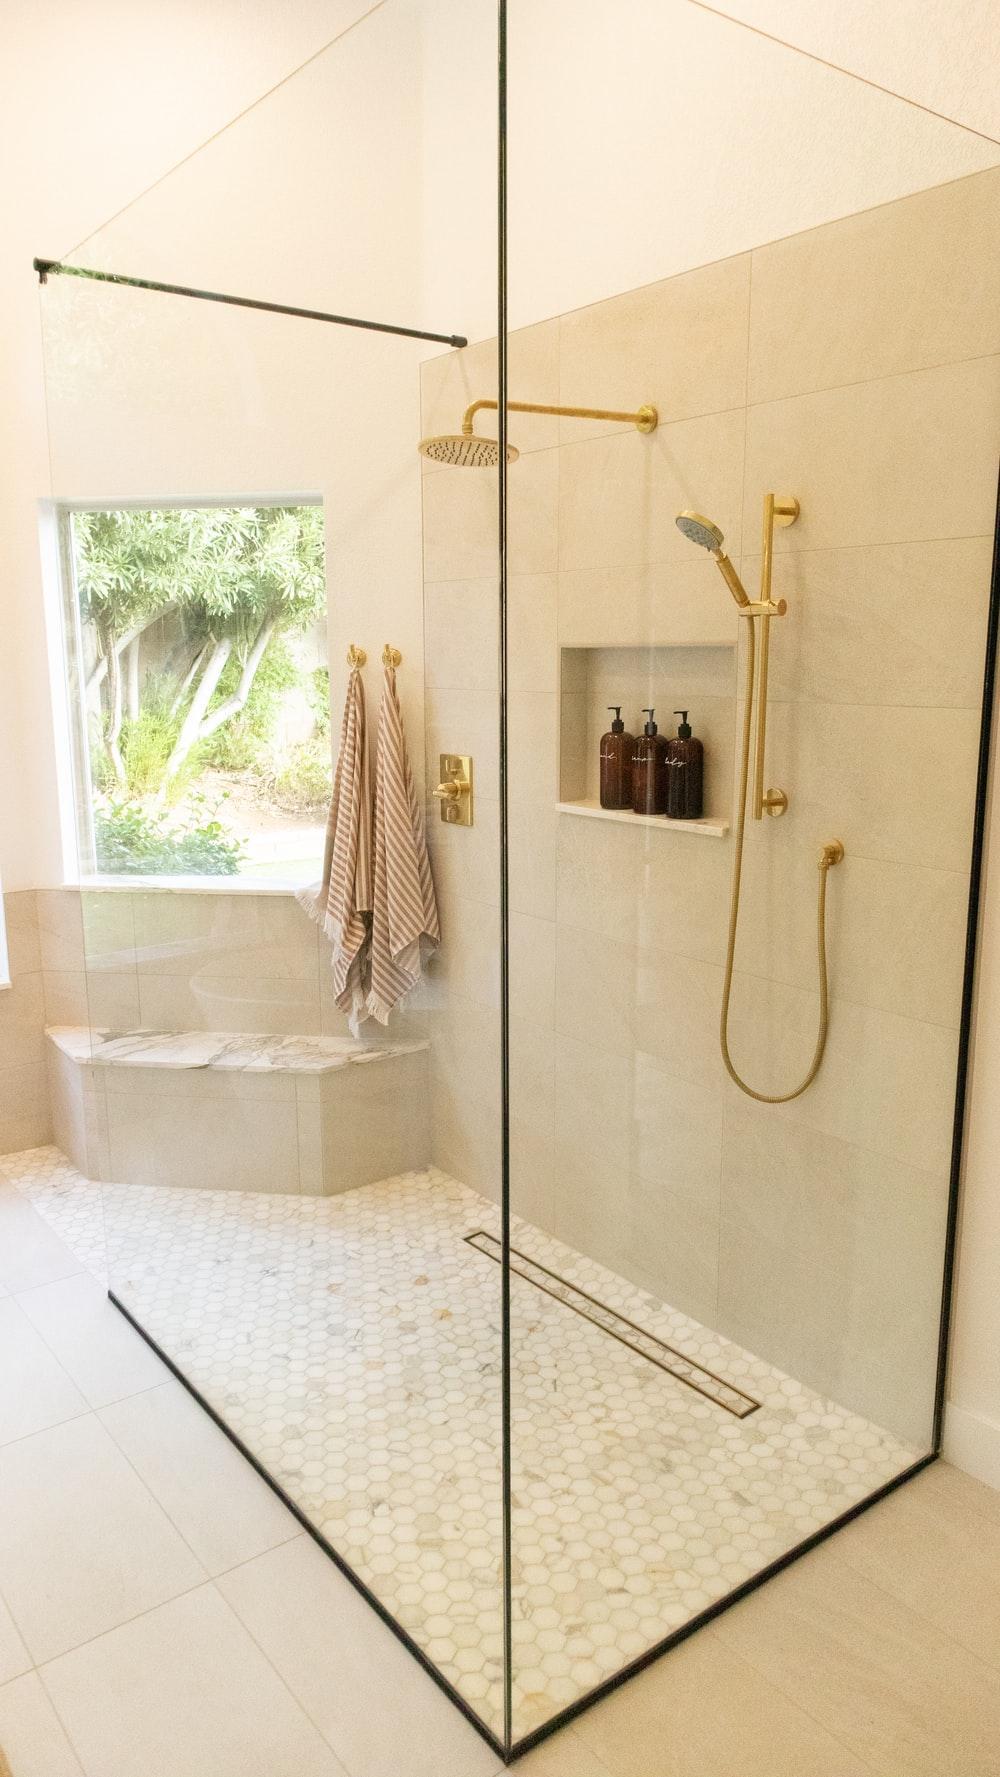 white bathtub with shower curtain